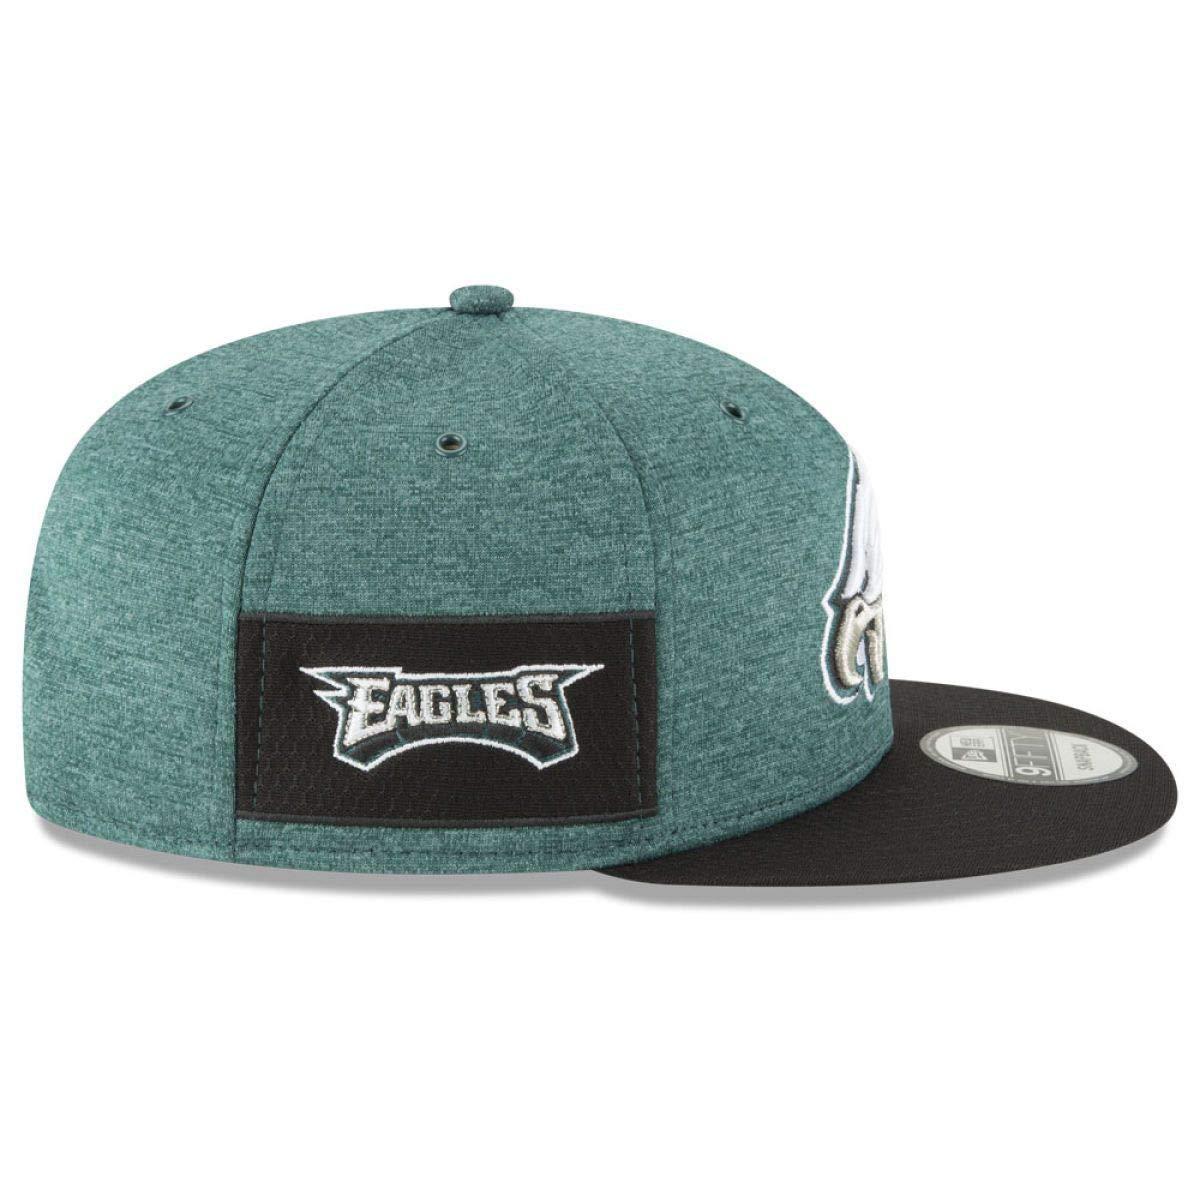 61186e2b52c Amazon.com  New Era Philadelphia Eagles 2018 NFL Sideline Home Official  9FIFTY Snapback Hat Green Black  Sports   Outdoors